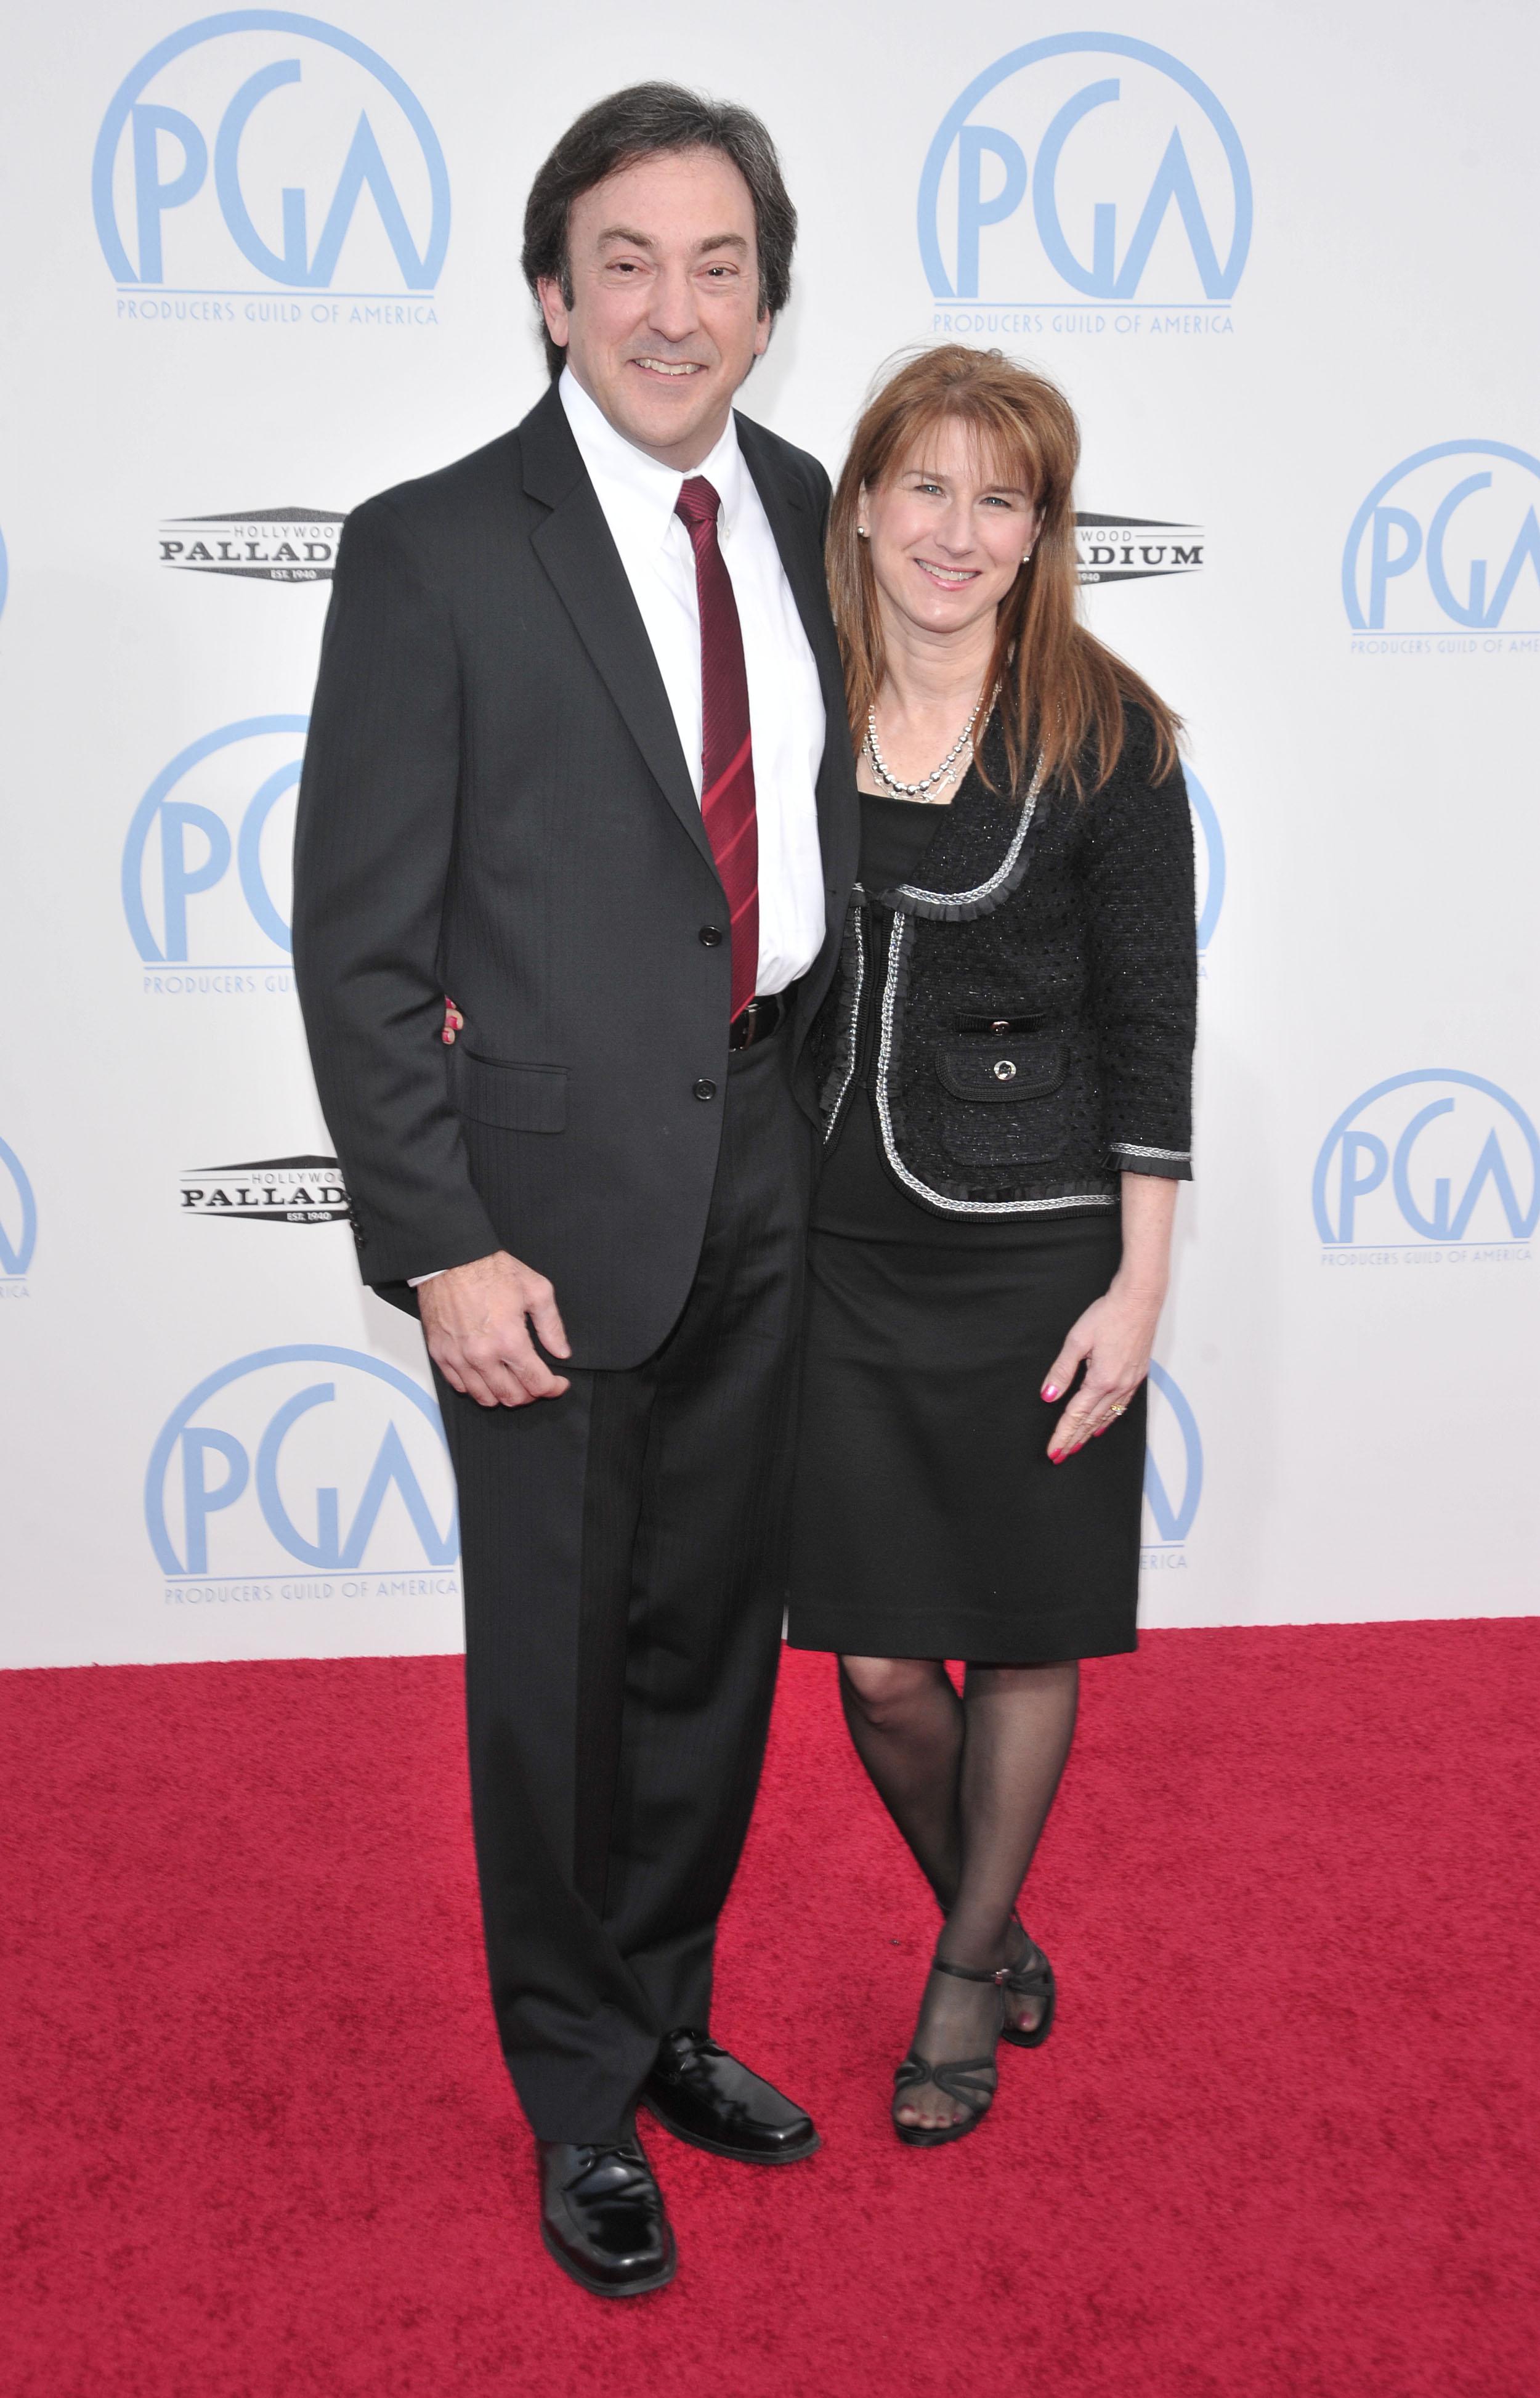 Producers Guild Awards Red Carpet